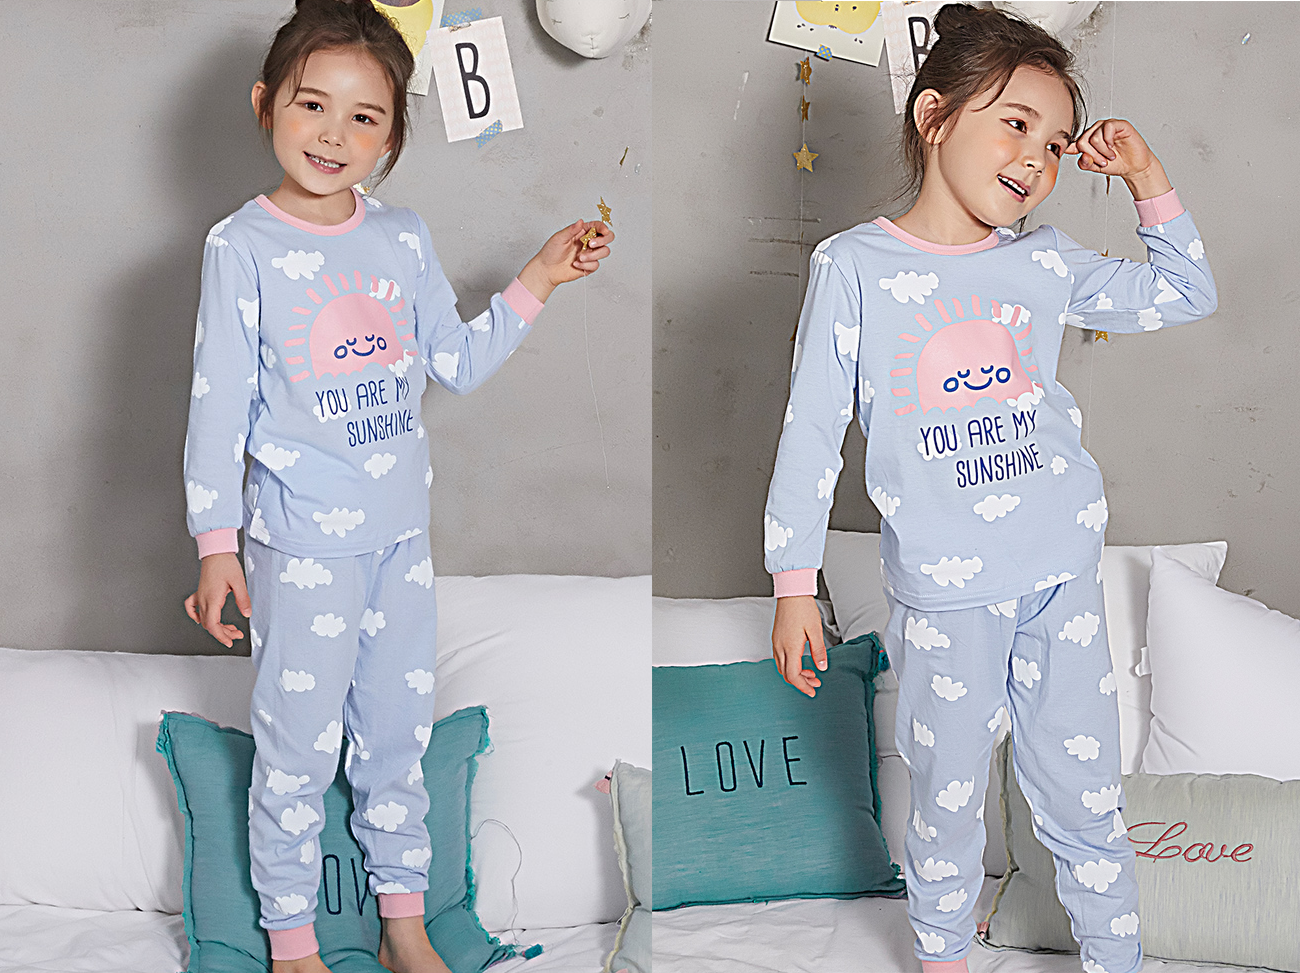 Olomimi My sunshine Kid Pyjamas - a girl wearing my sunshine purple kid pyjamas set standing and smiling